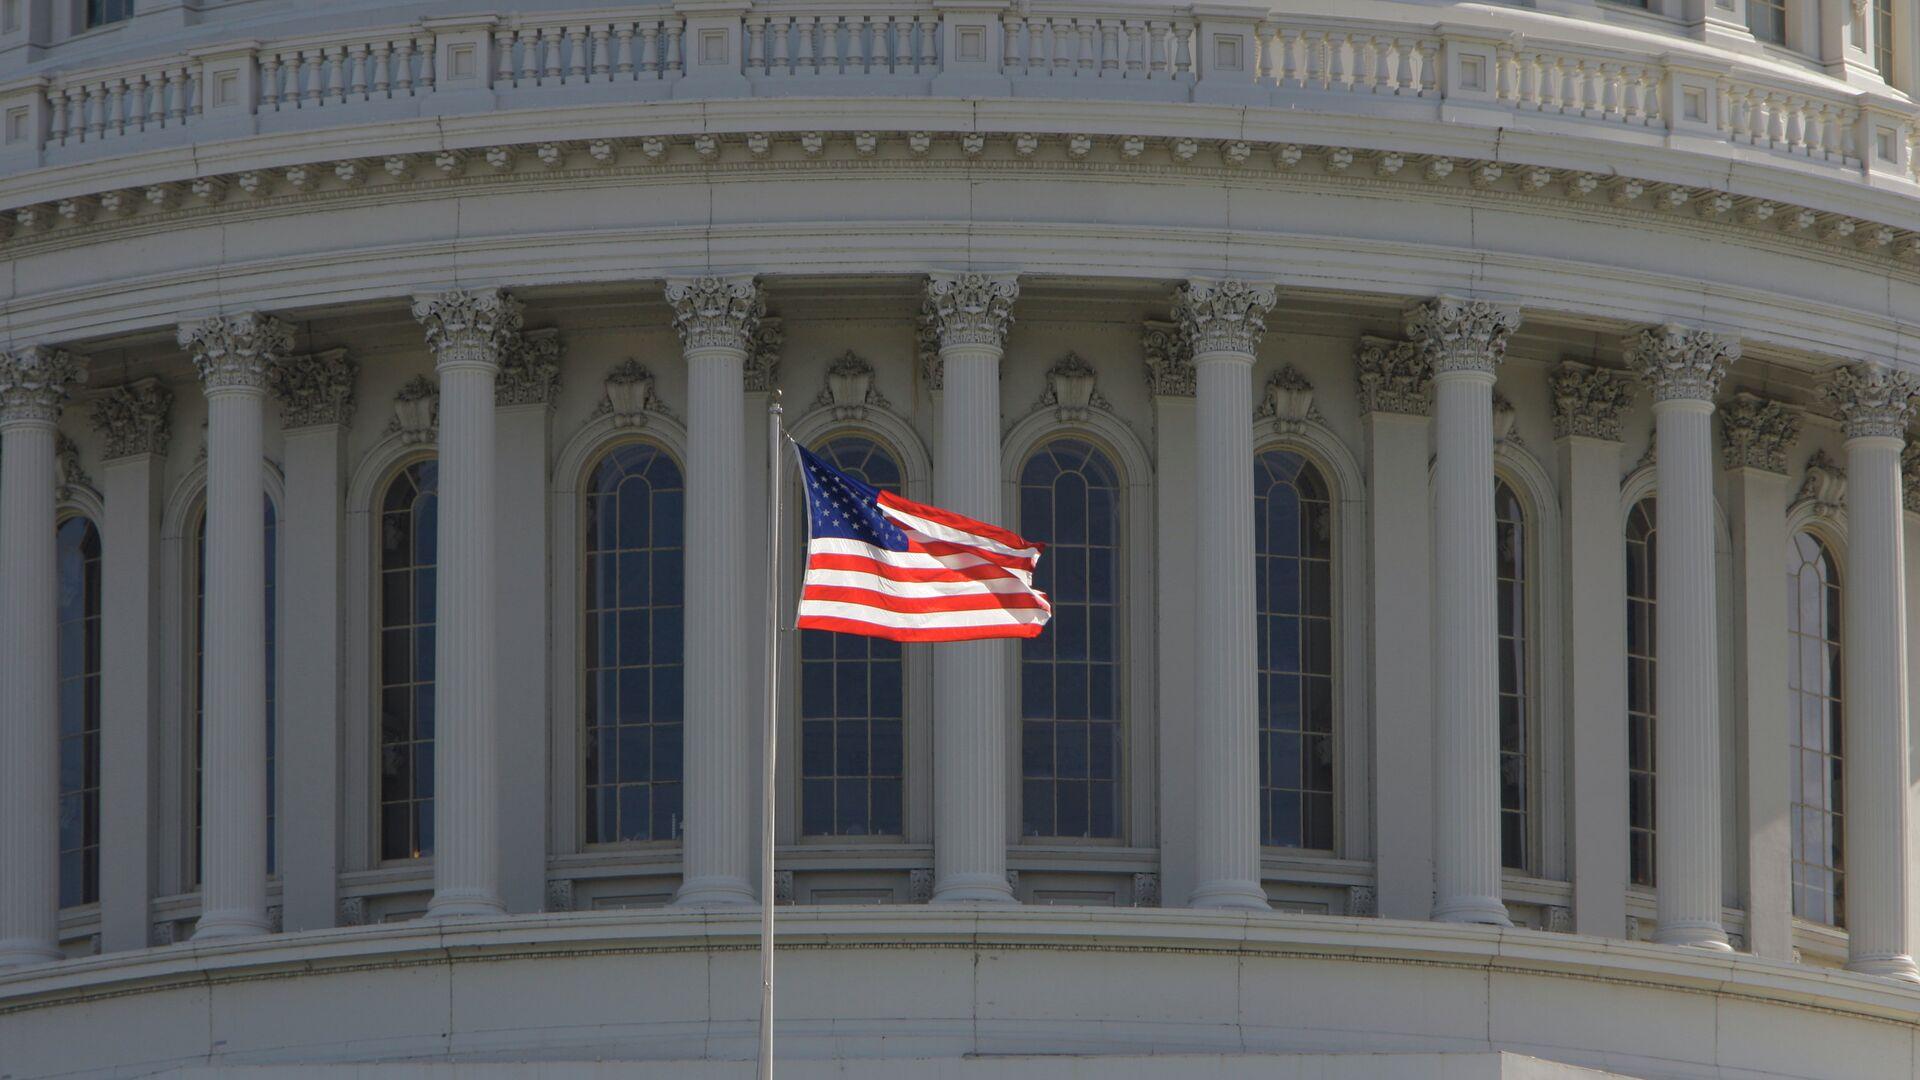 Bandera estadounidense frente al Capitolio de EEUU en Washington - Sputnik Mundo, 1920, 18.03.2021